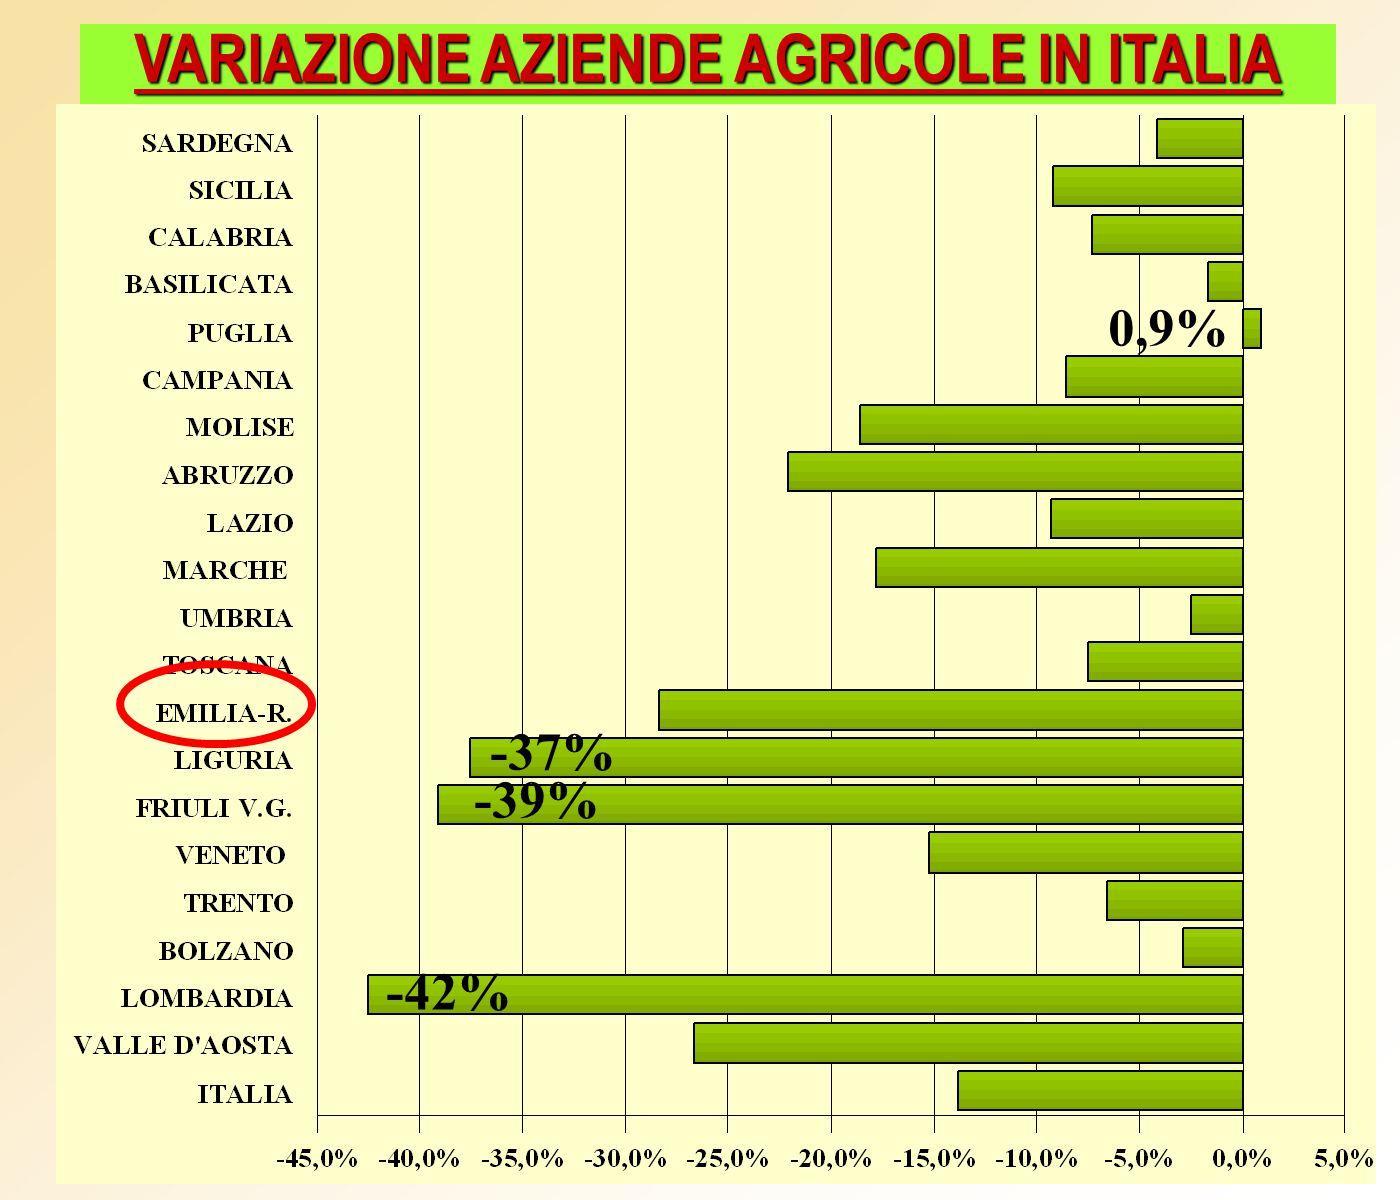 SUPERFICIE AD ARBOREE MEDIA PER AZIENDA (ettari) 4,5 2,5 4 +50% +46%